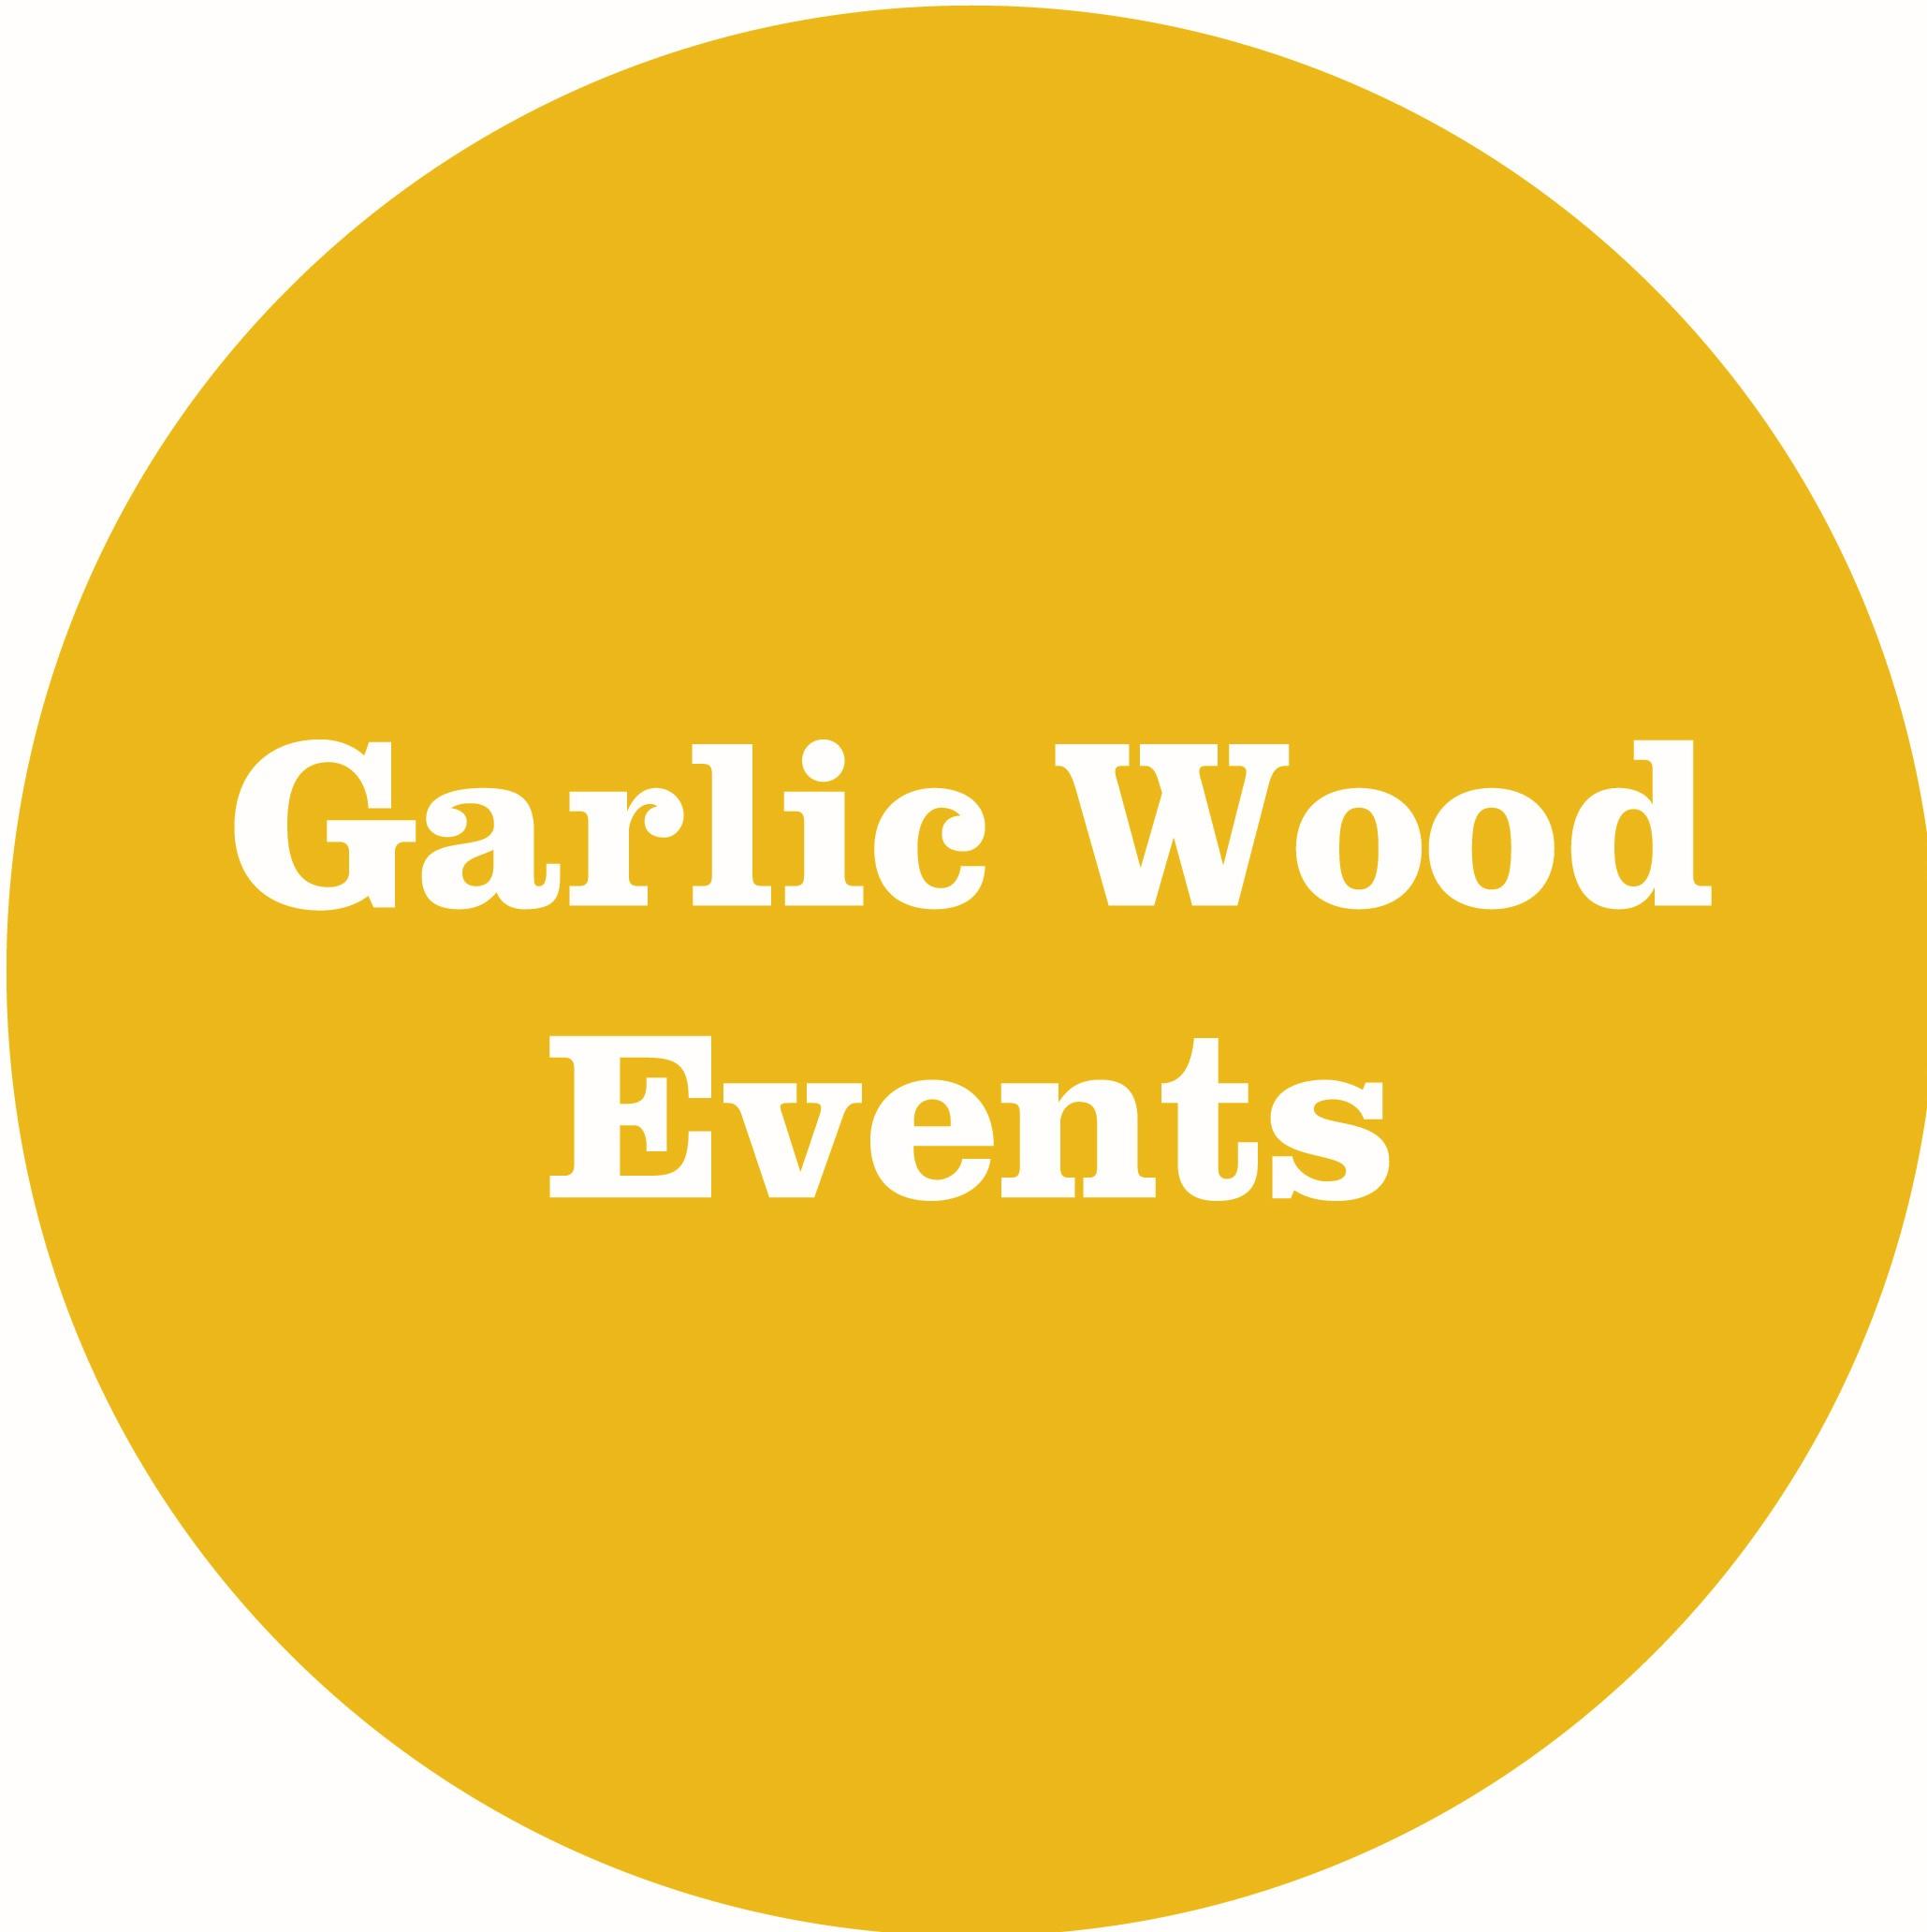 Garlic Wood Events